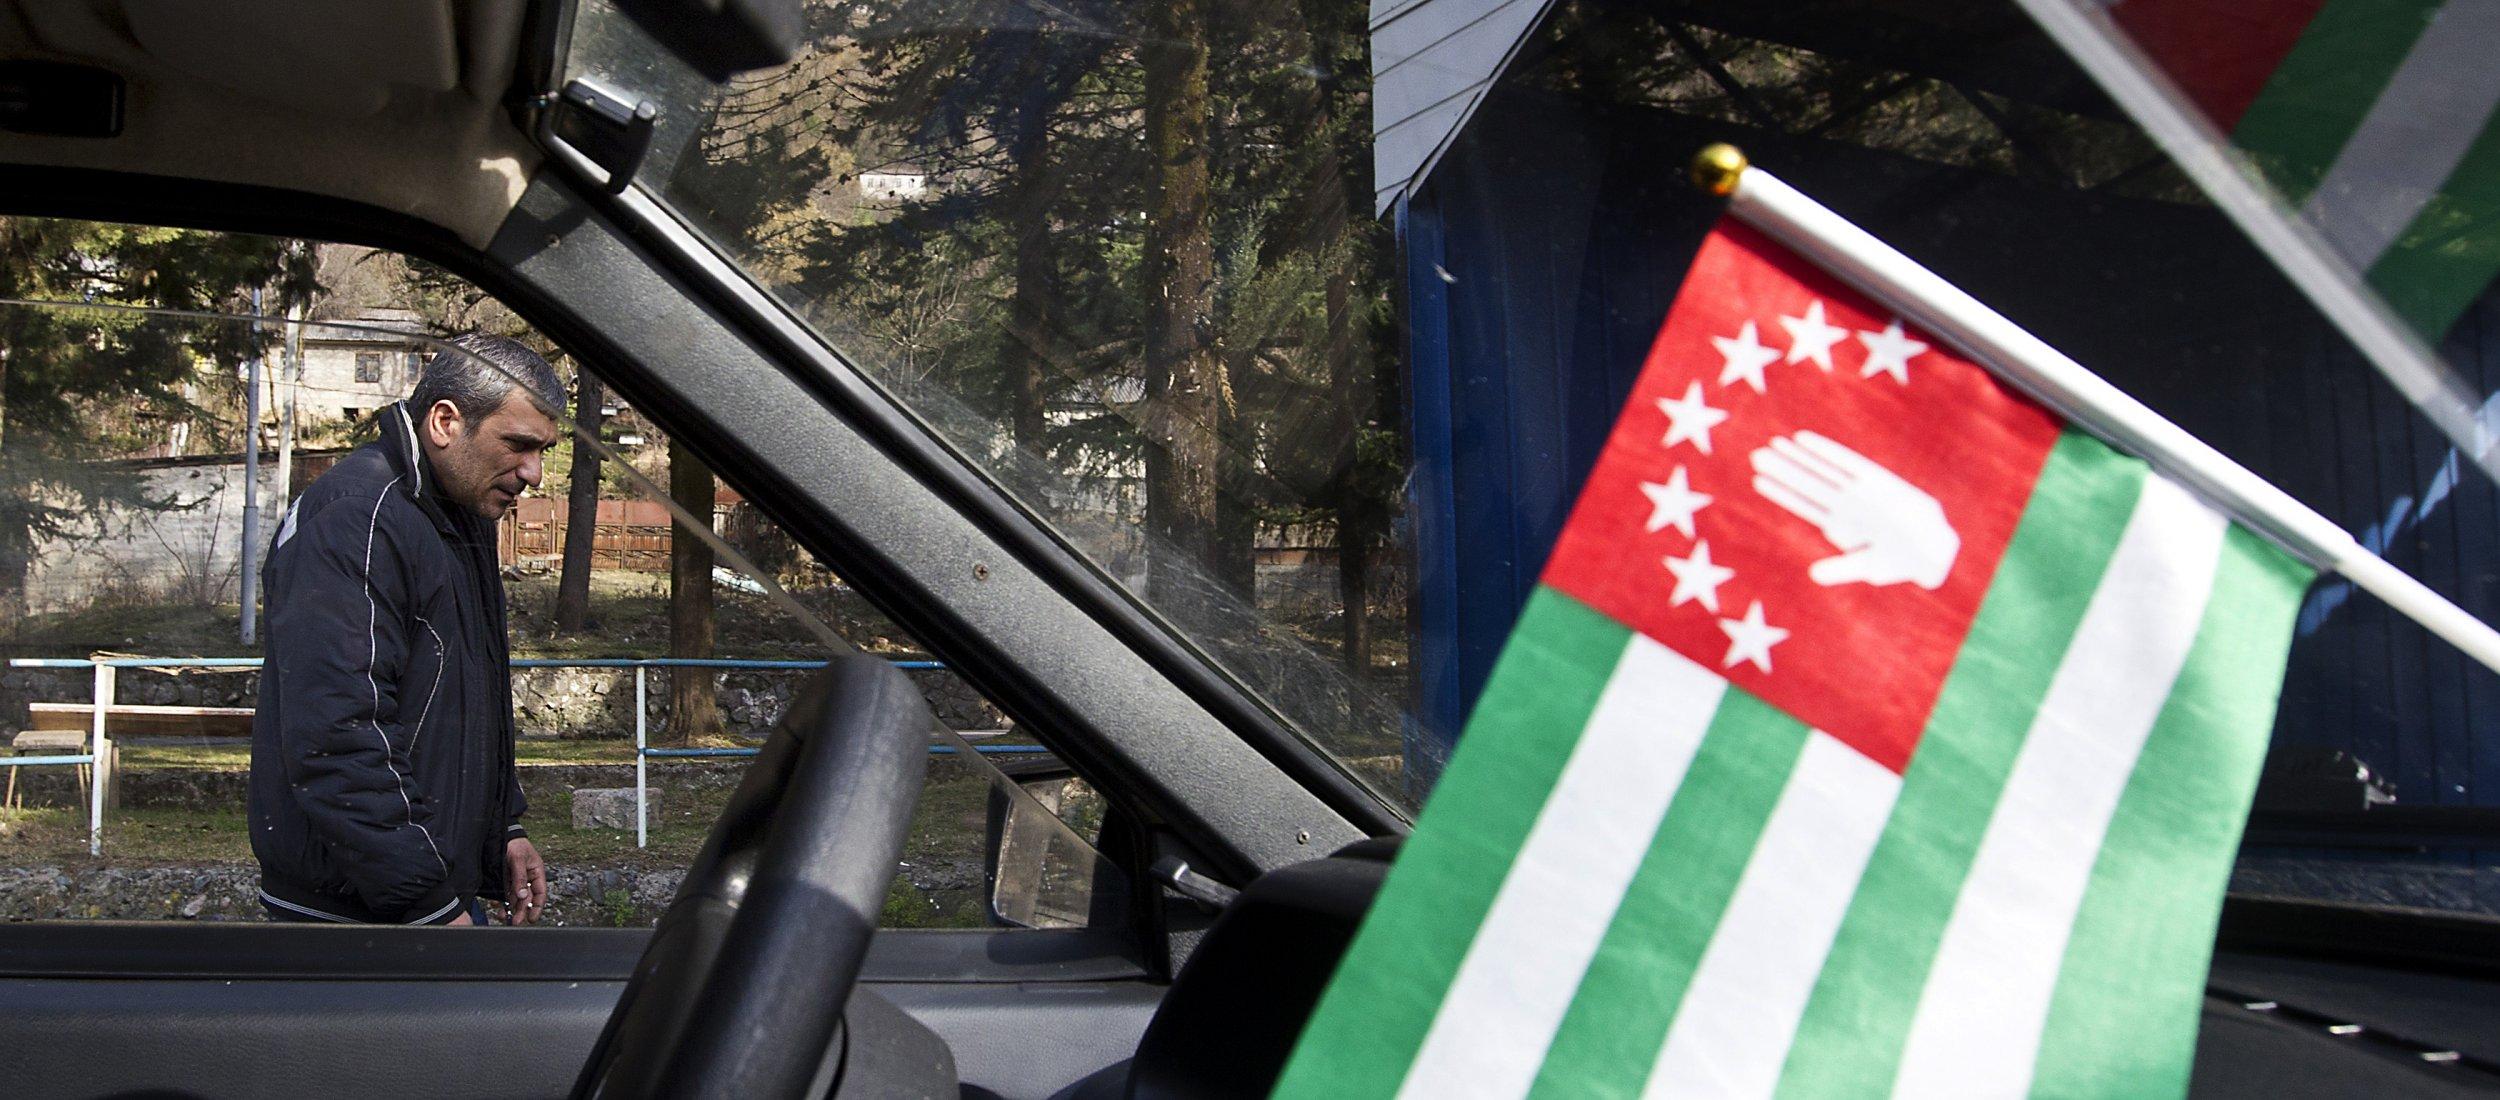 1-10-14_DL0502_Abkhazia1